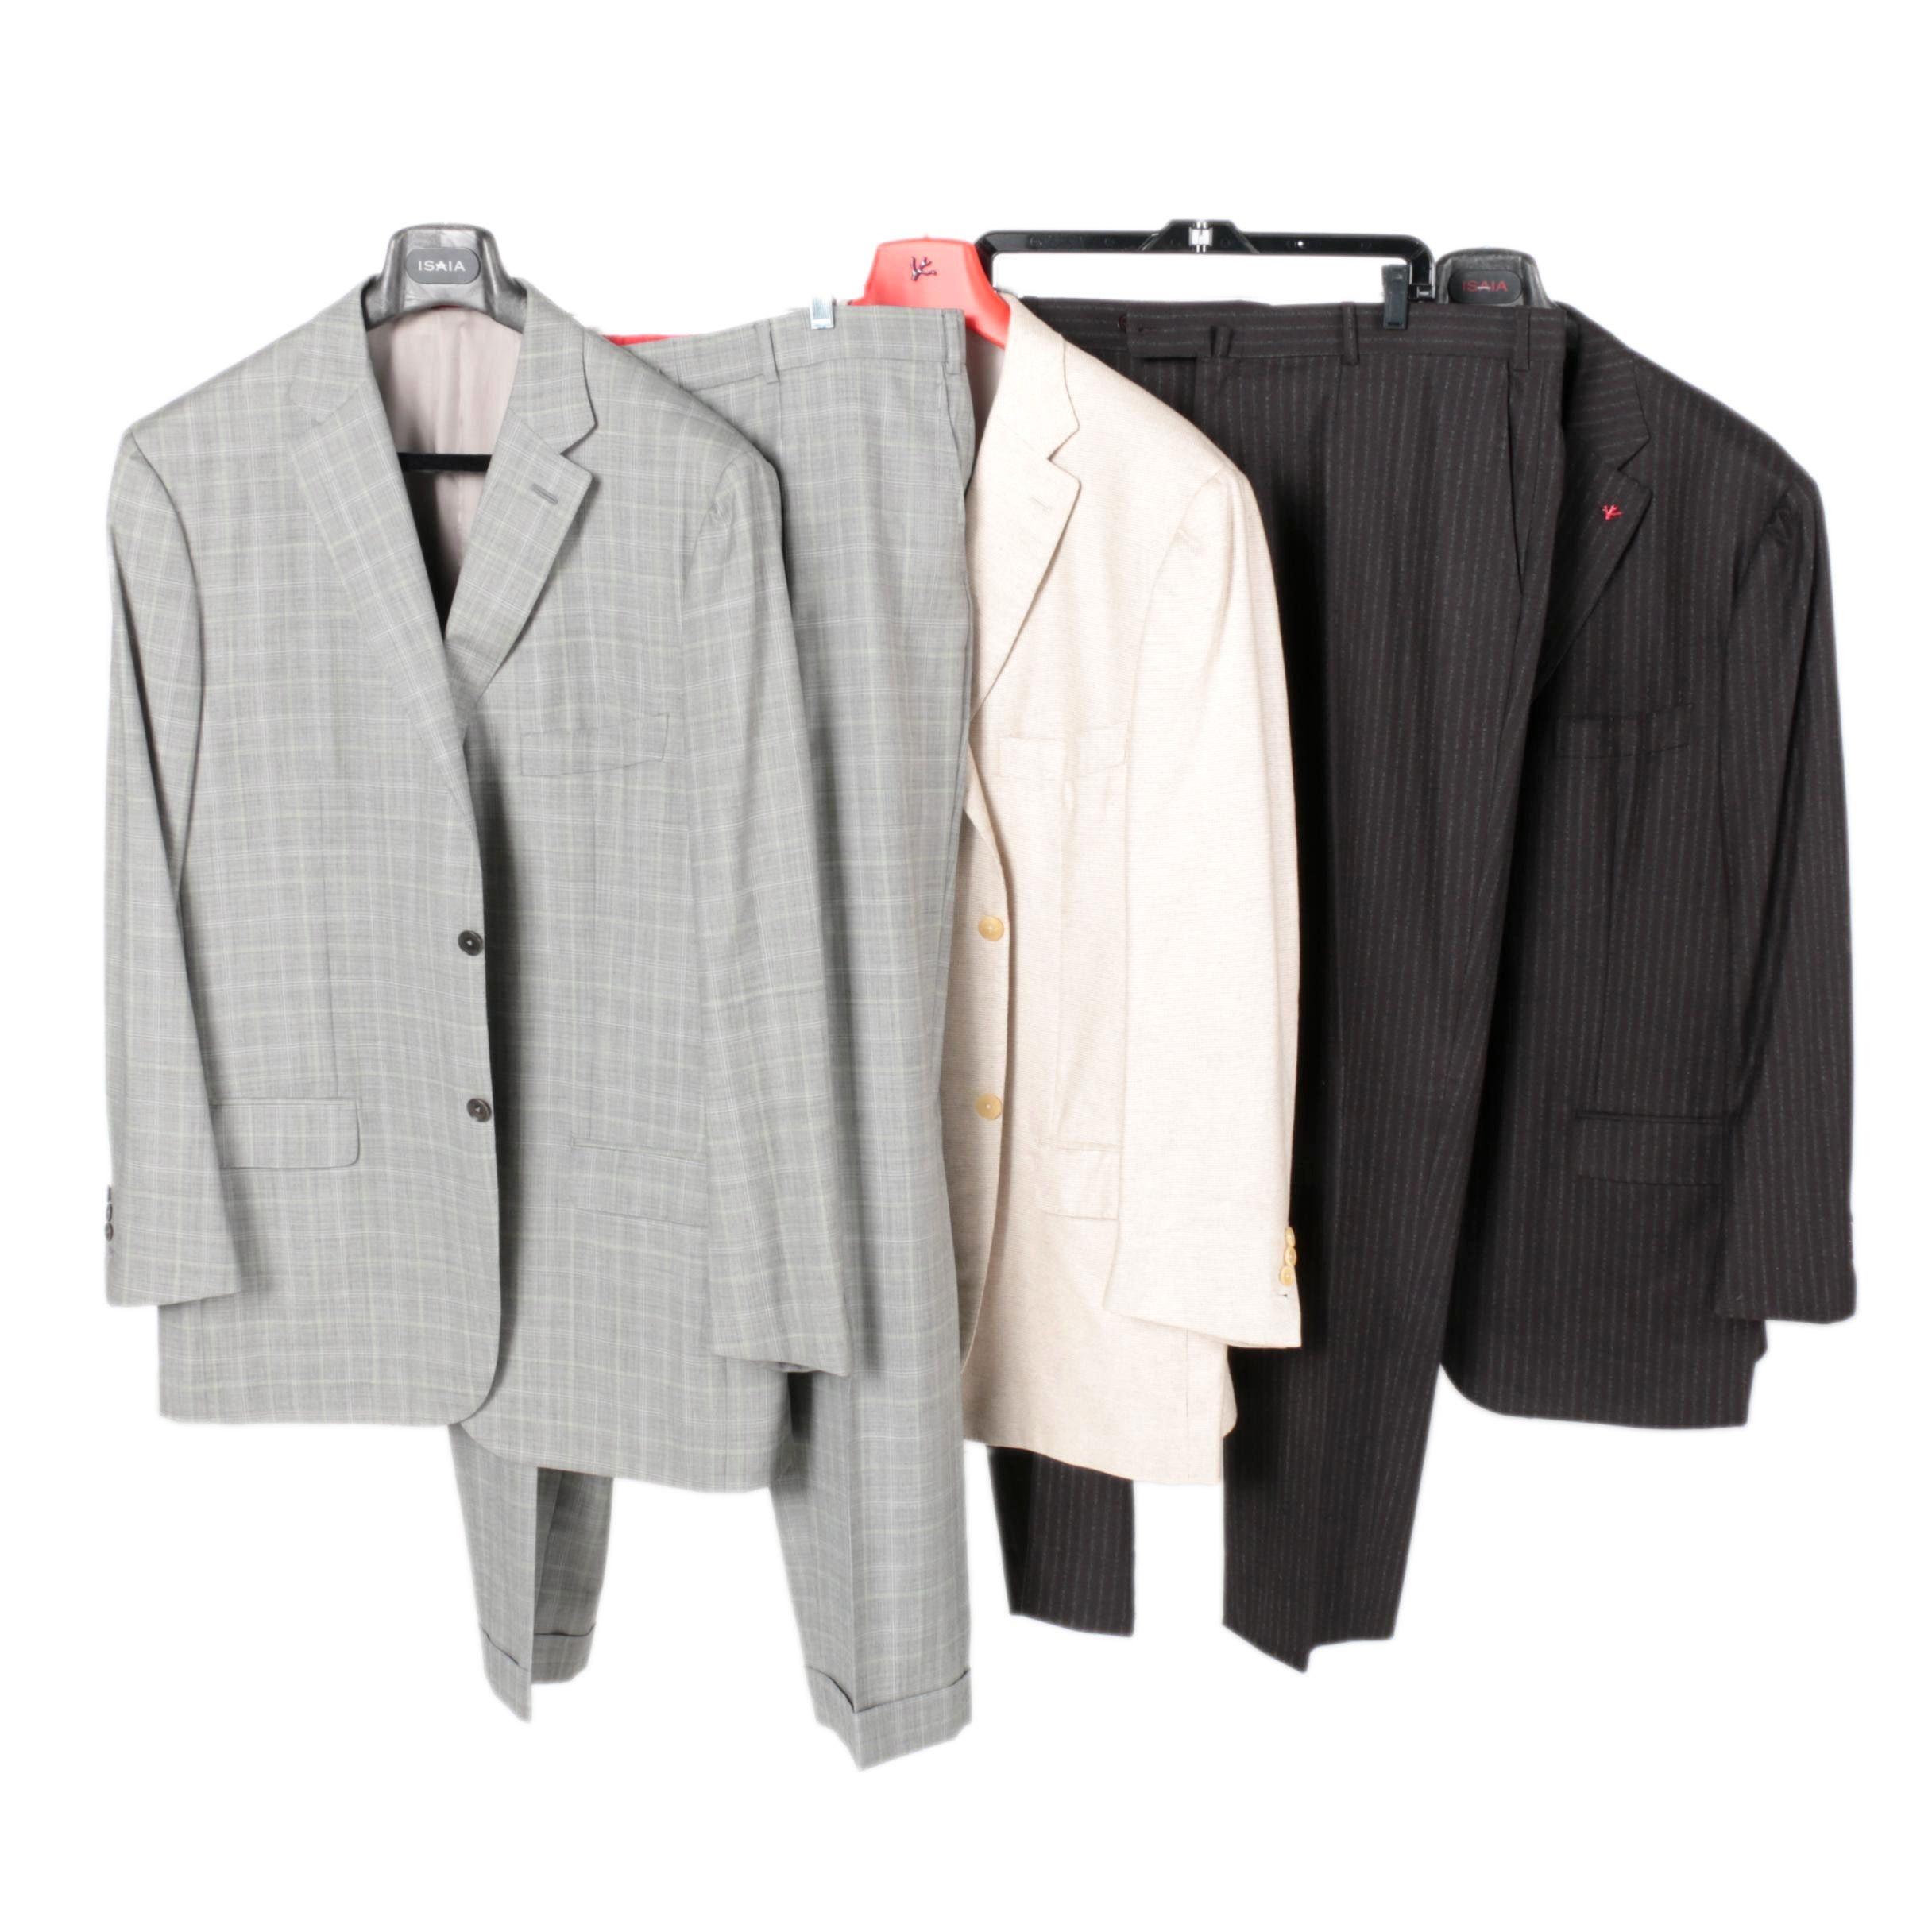 Men's Isaia Napoli Suits